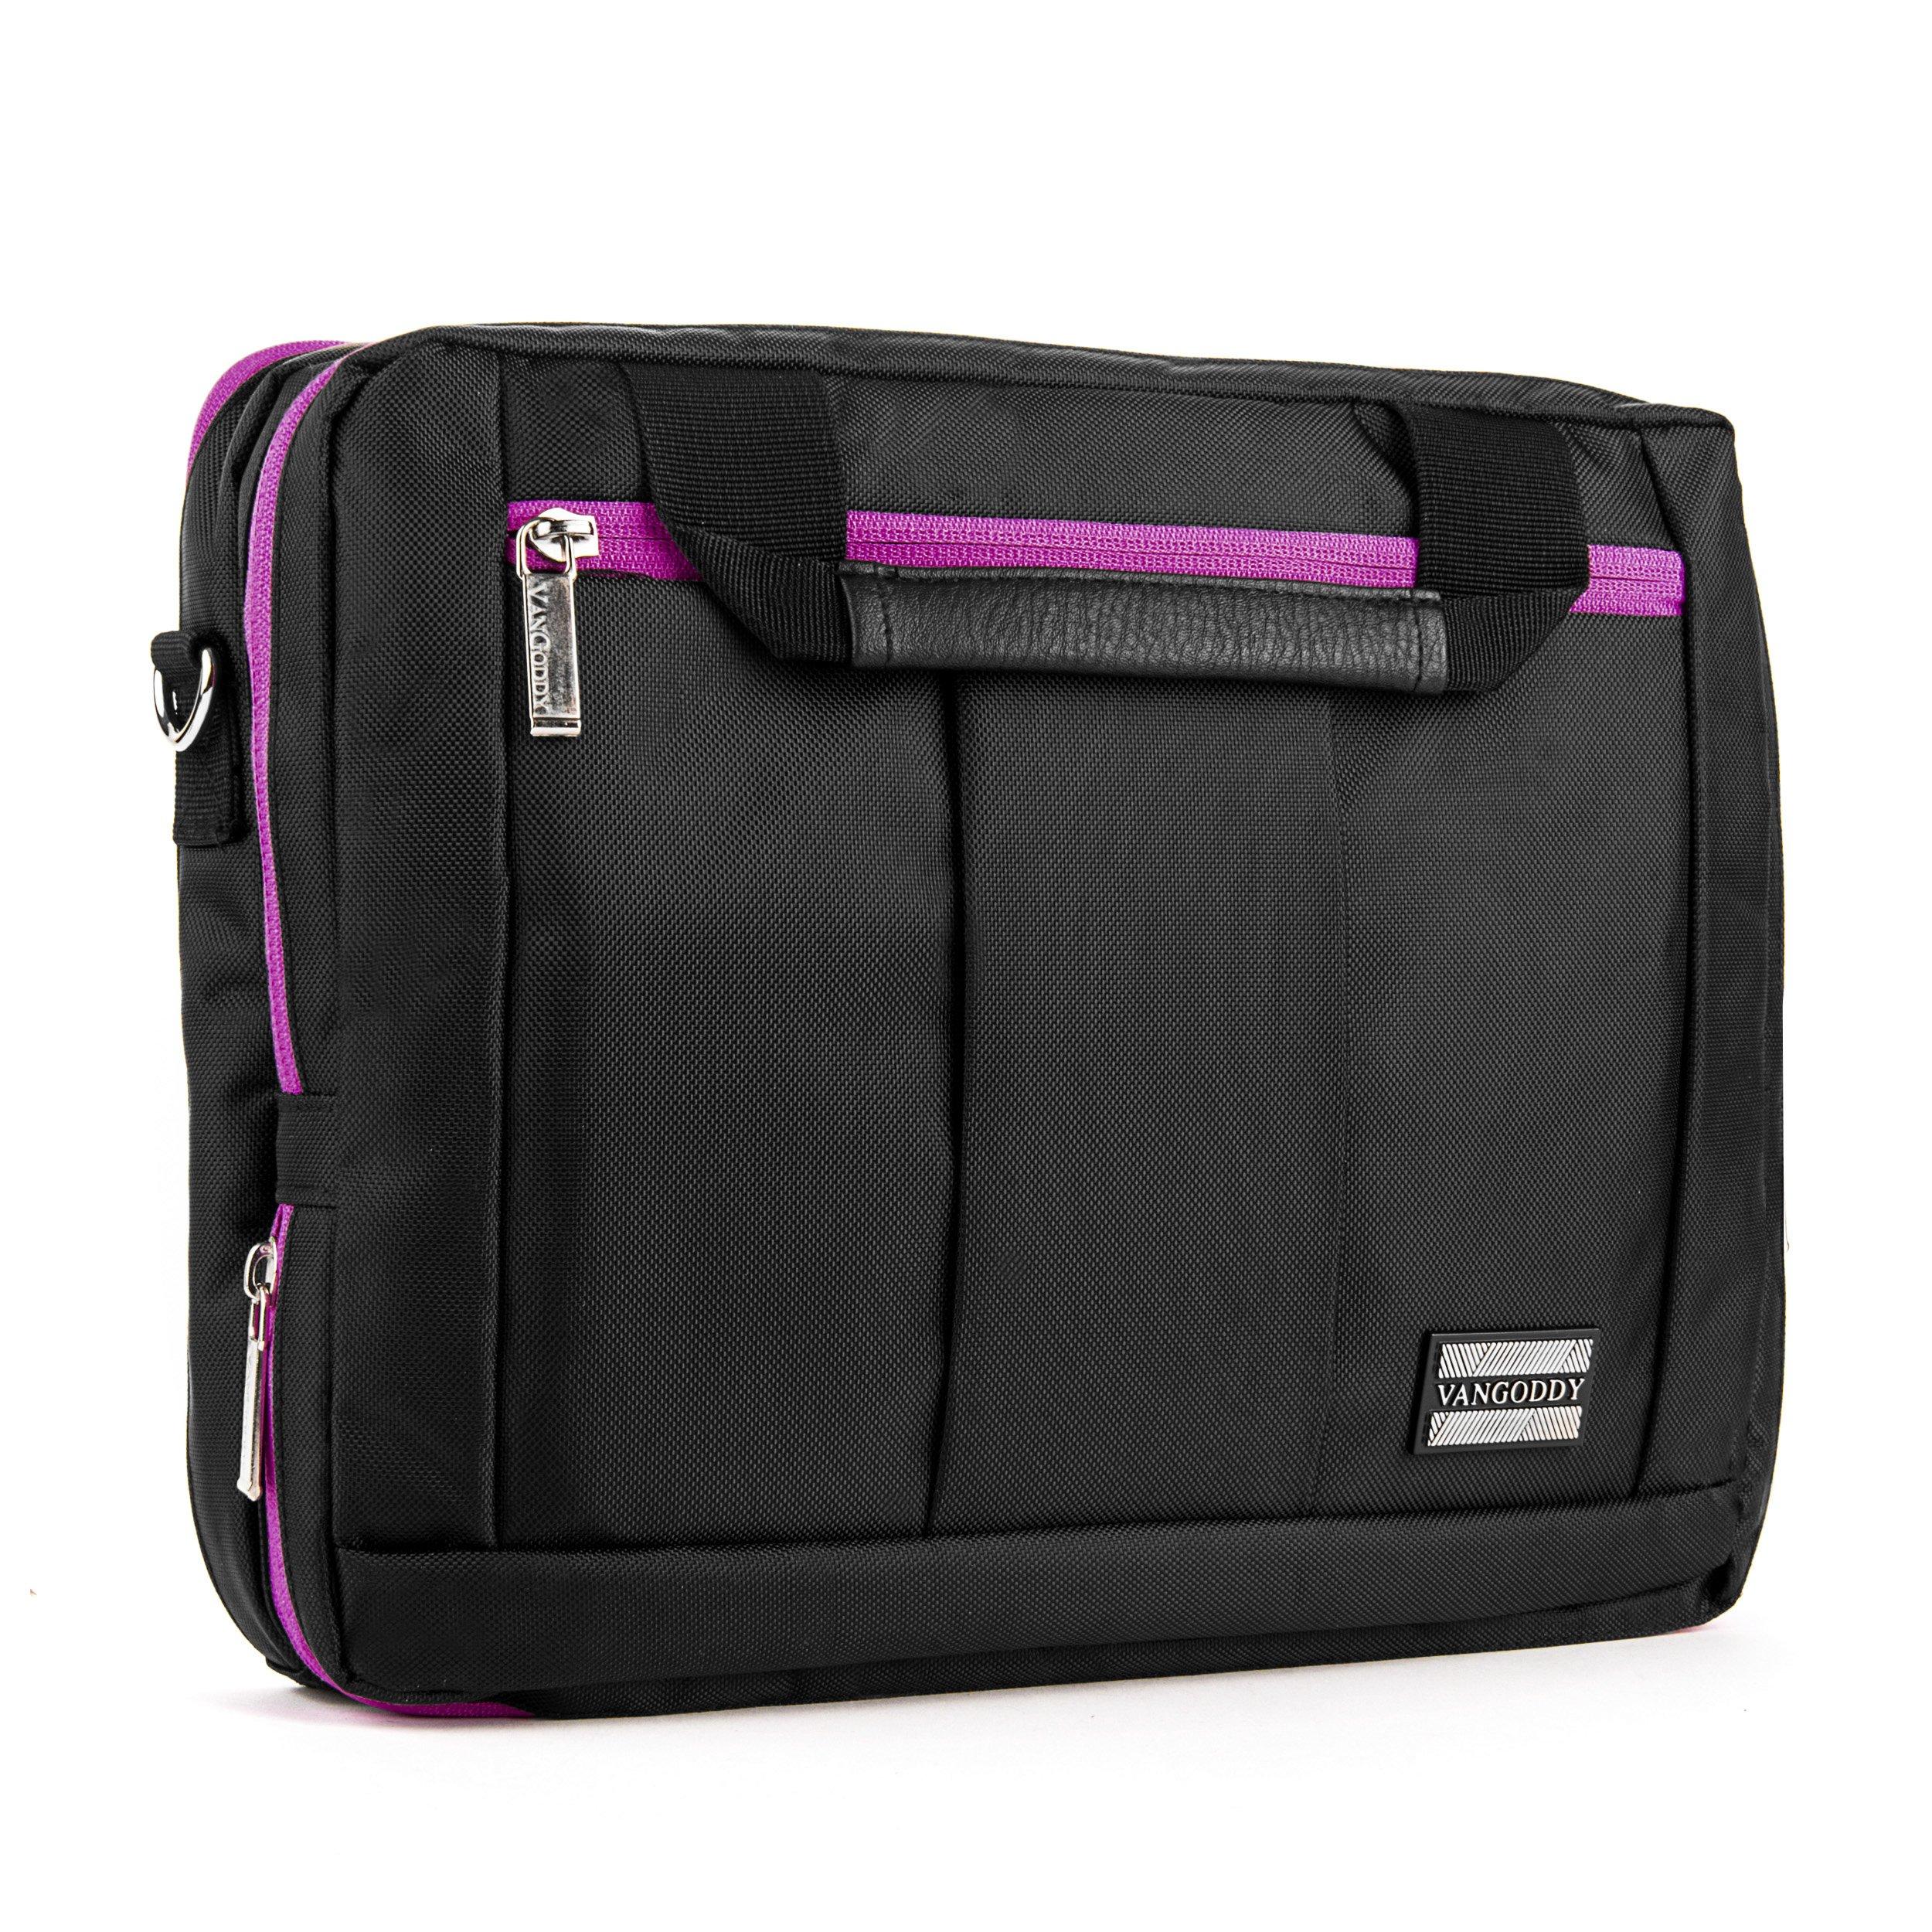 Apollo School Business Travel Bag For Lenovo 14'' - 15.6'' Laptops (Flex, IdeaPad, ThinkPad, Yoga